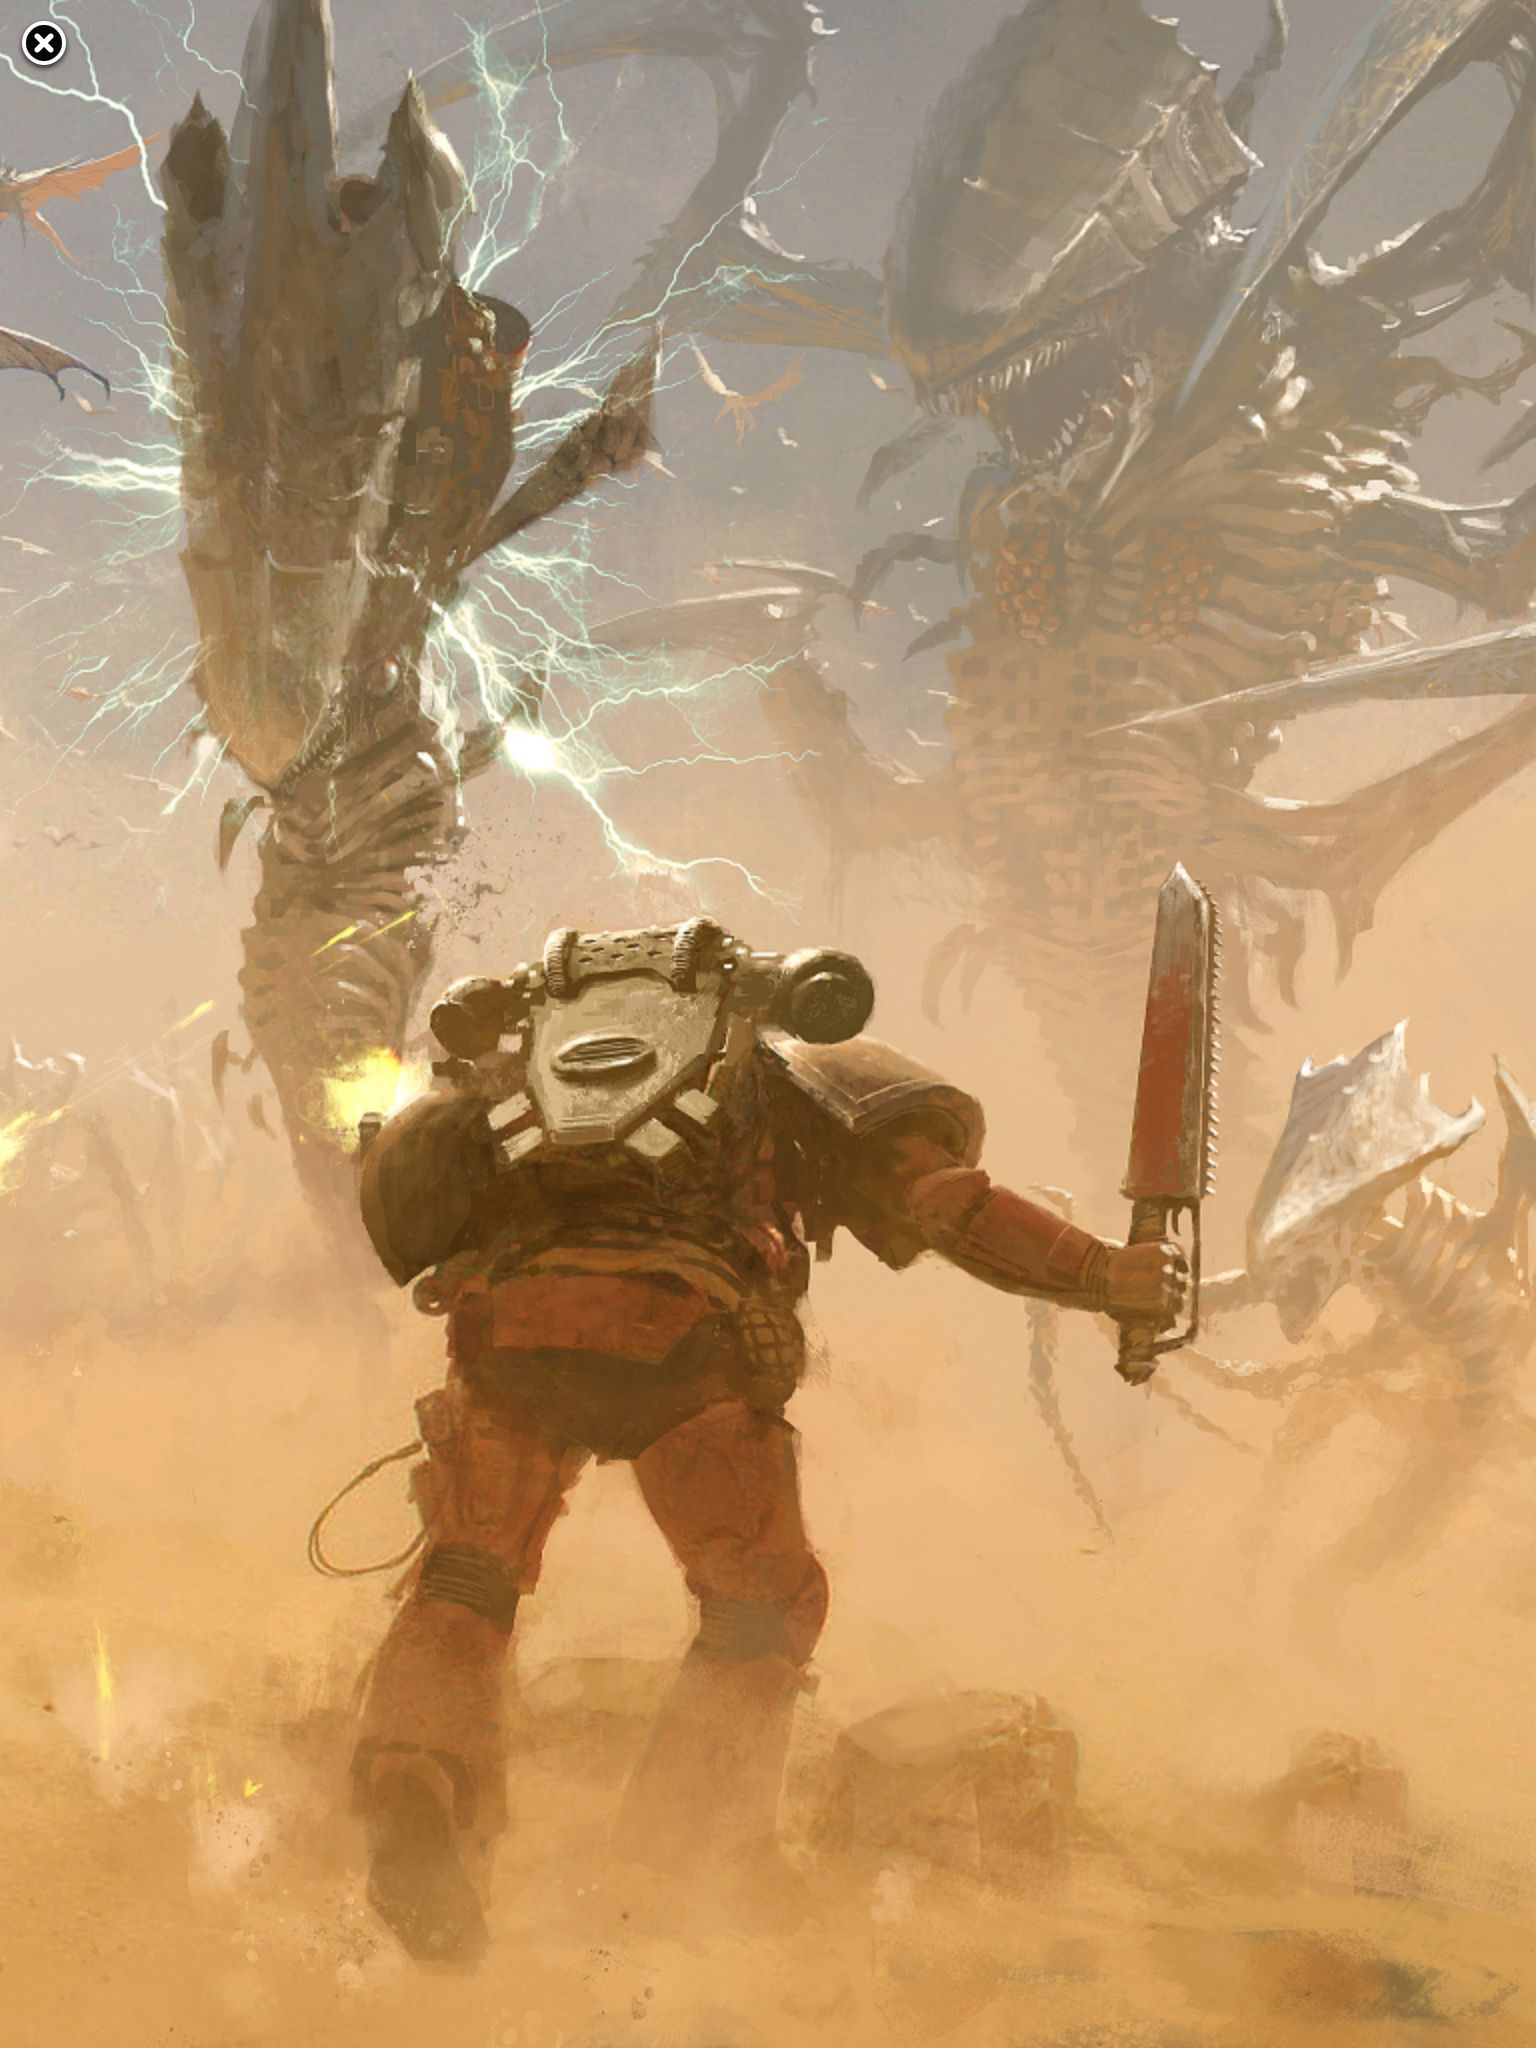 Flesh Tearers vs Tyranids by Jose Cabrera | Warhammer 40k artwork ...